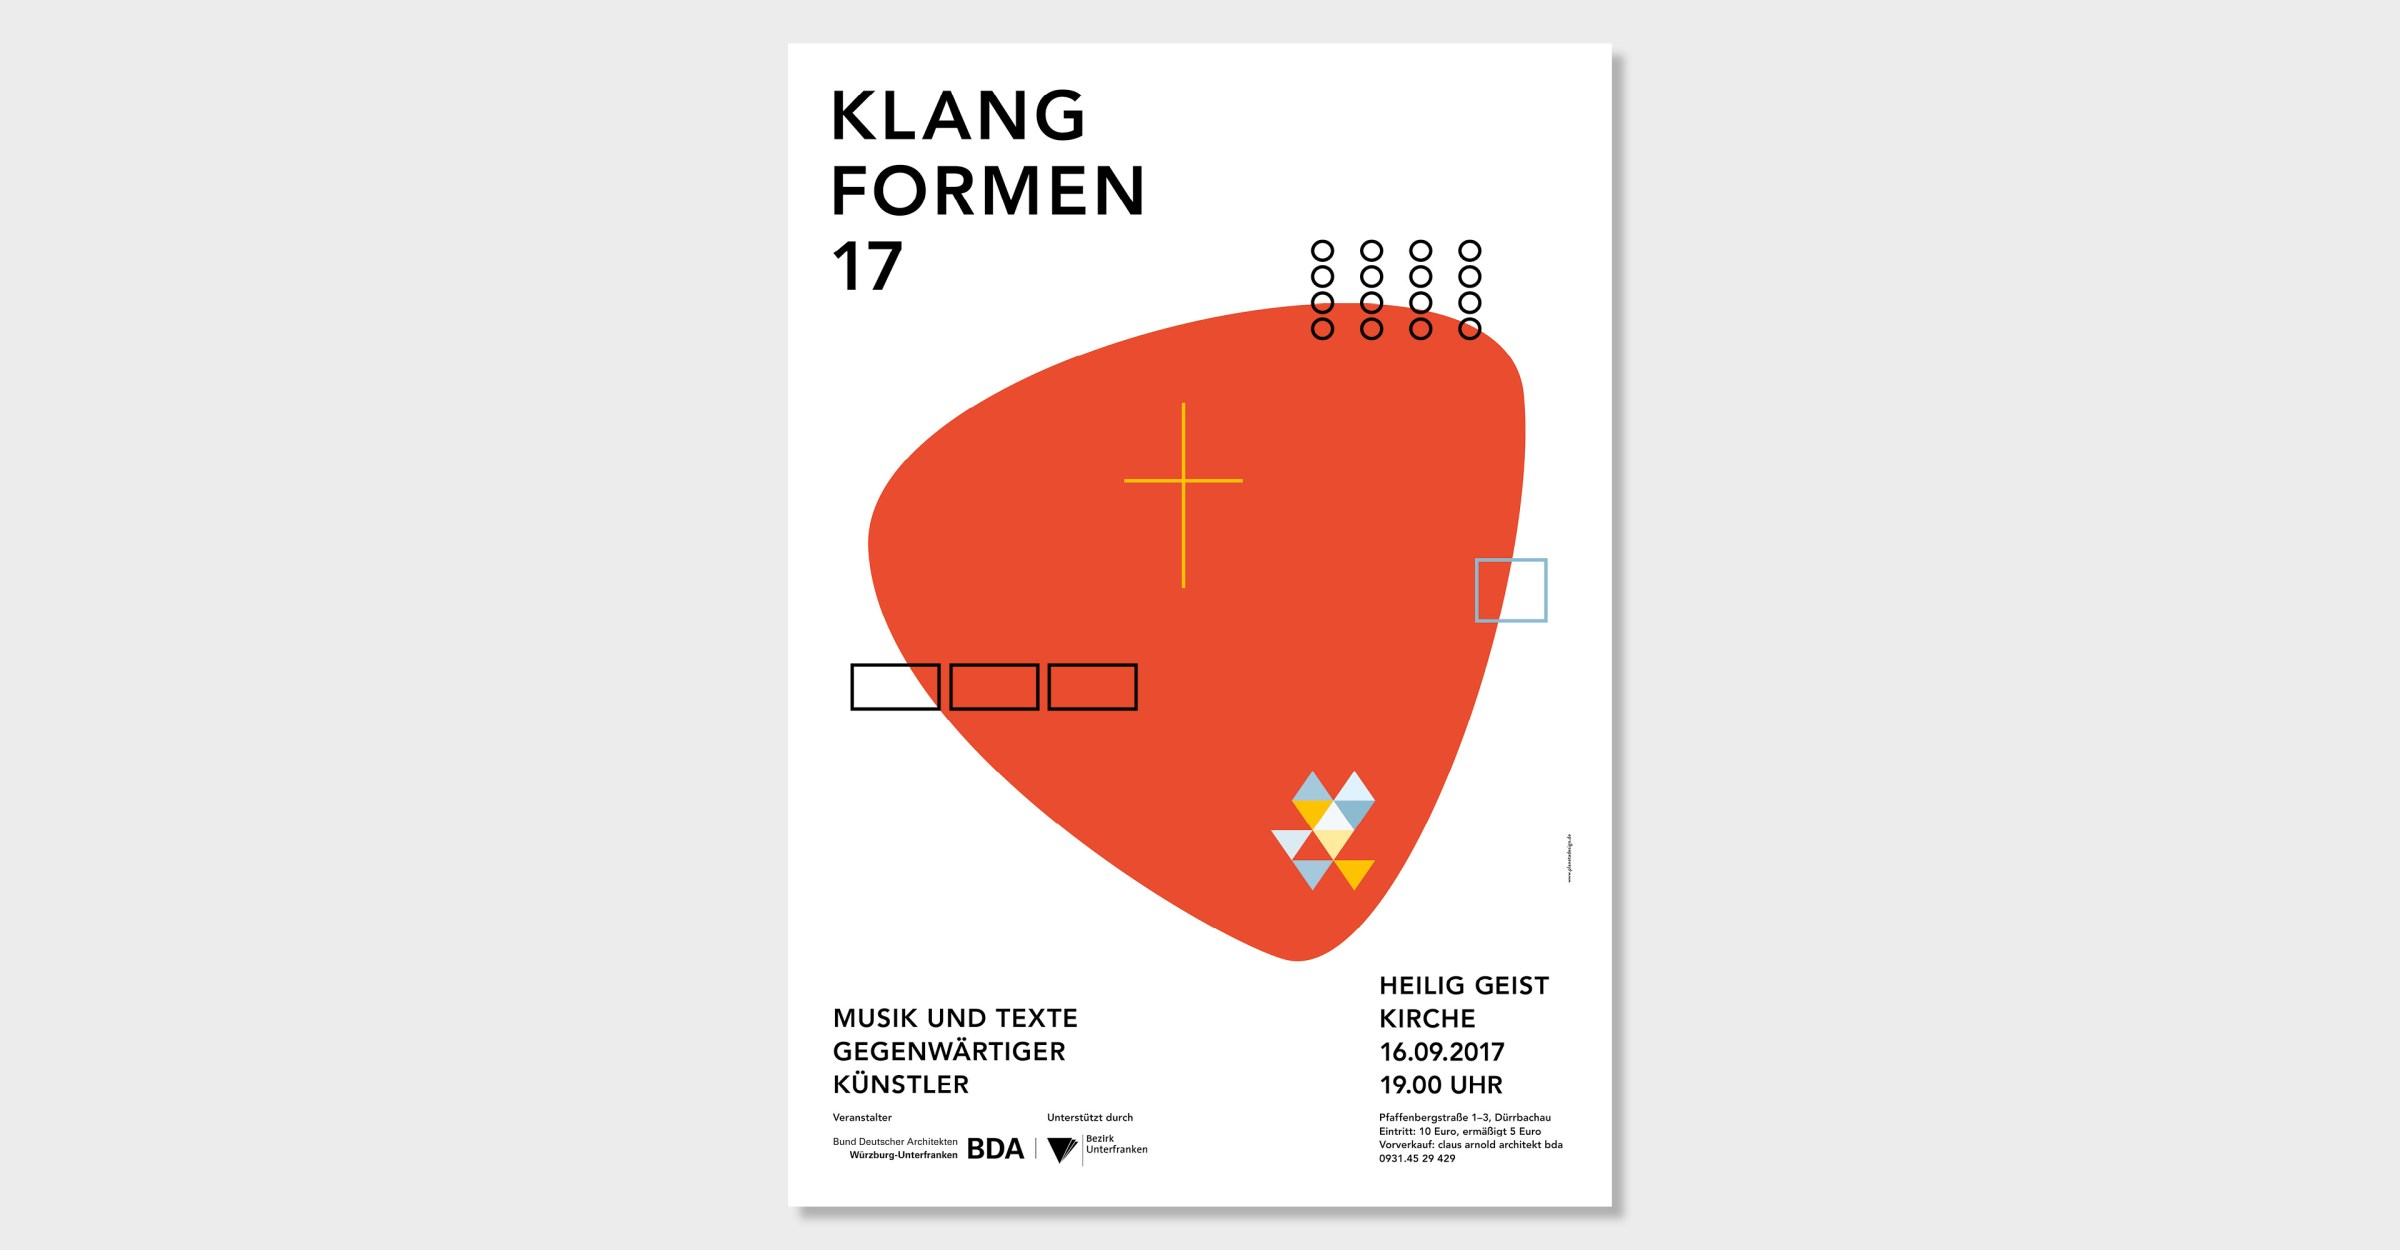 BDA Einladungskarte Klangform Heilig Geist Kirche Würzburg